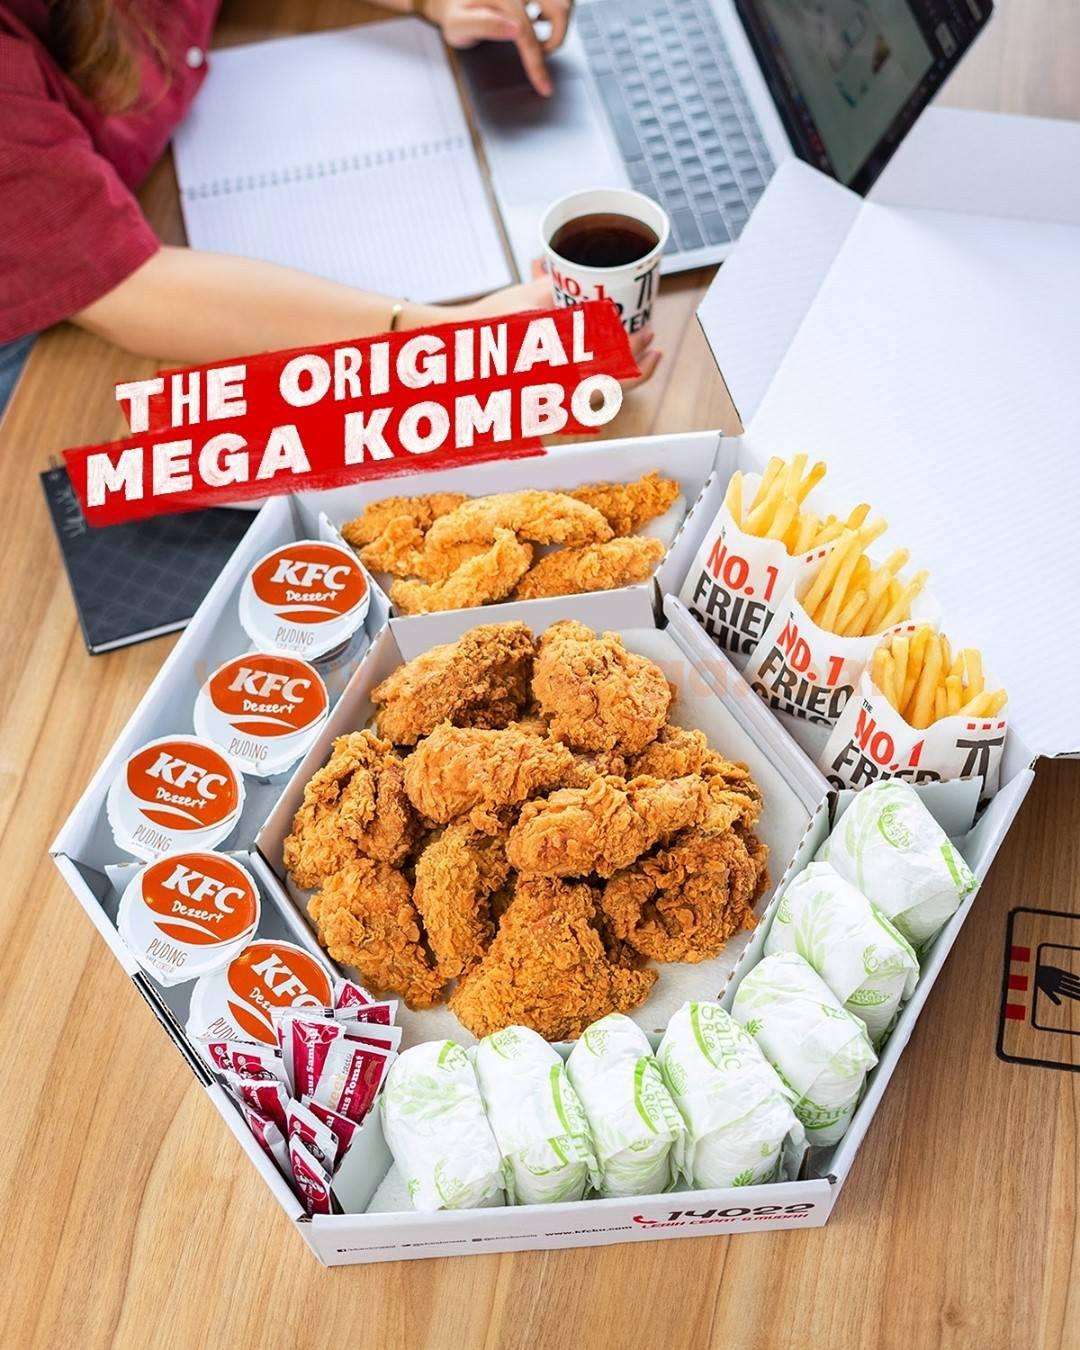 KFC MEGA COMBO - Paket MEGA KOMBO Harga hanya Rp 240.000 Aja